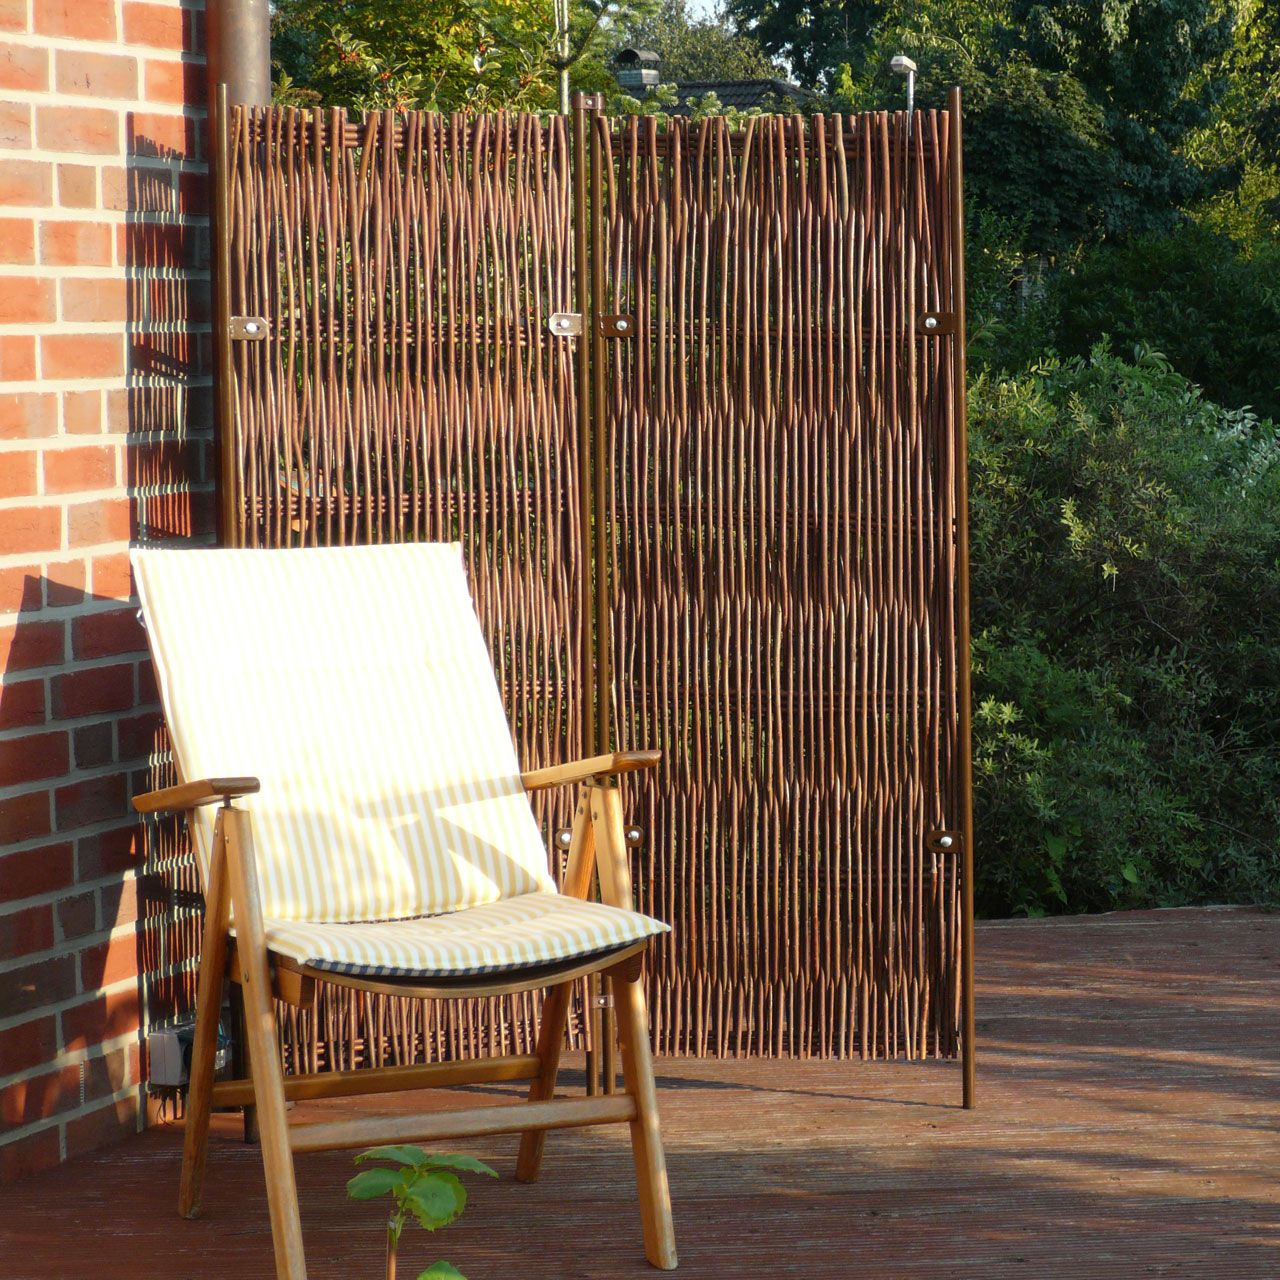 Full Size of Paravent Bambus Balkon Skagen Hoch Garten Bett Wohnzimmer Paravent Bambus Balkon